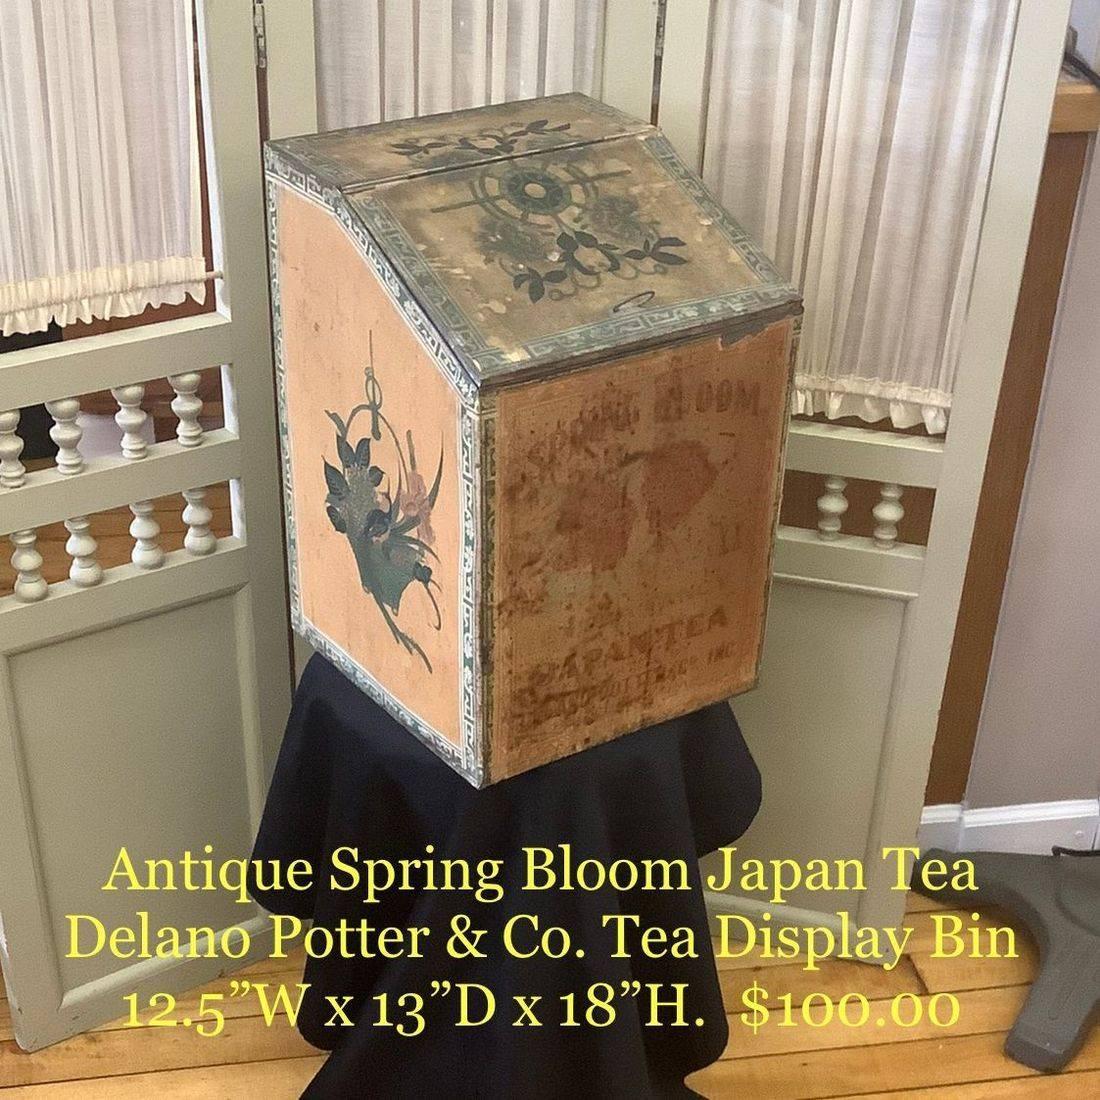 Antique Spring Bloom Japan Tea Delano Potter & Co. Tea Tin Display Bin   $100.00